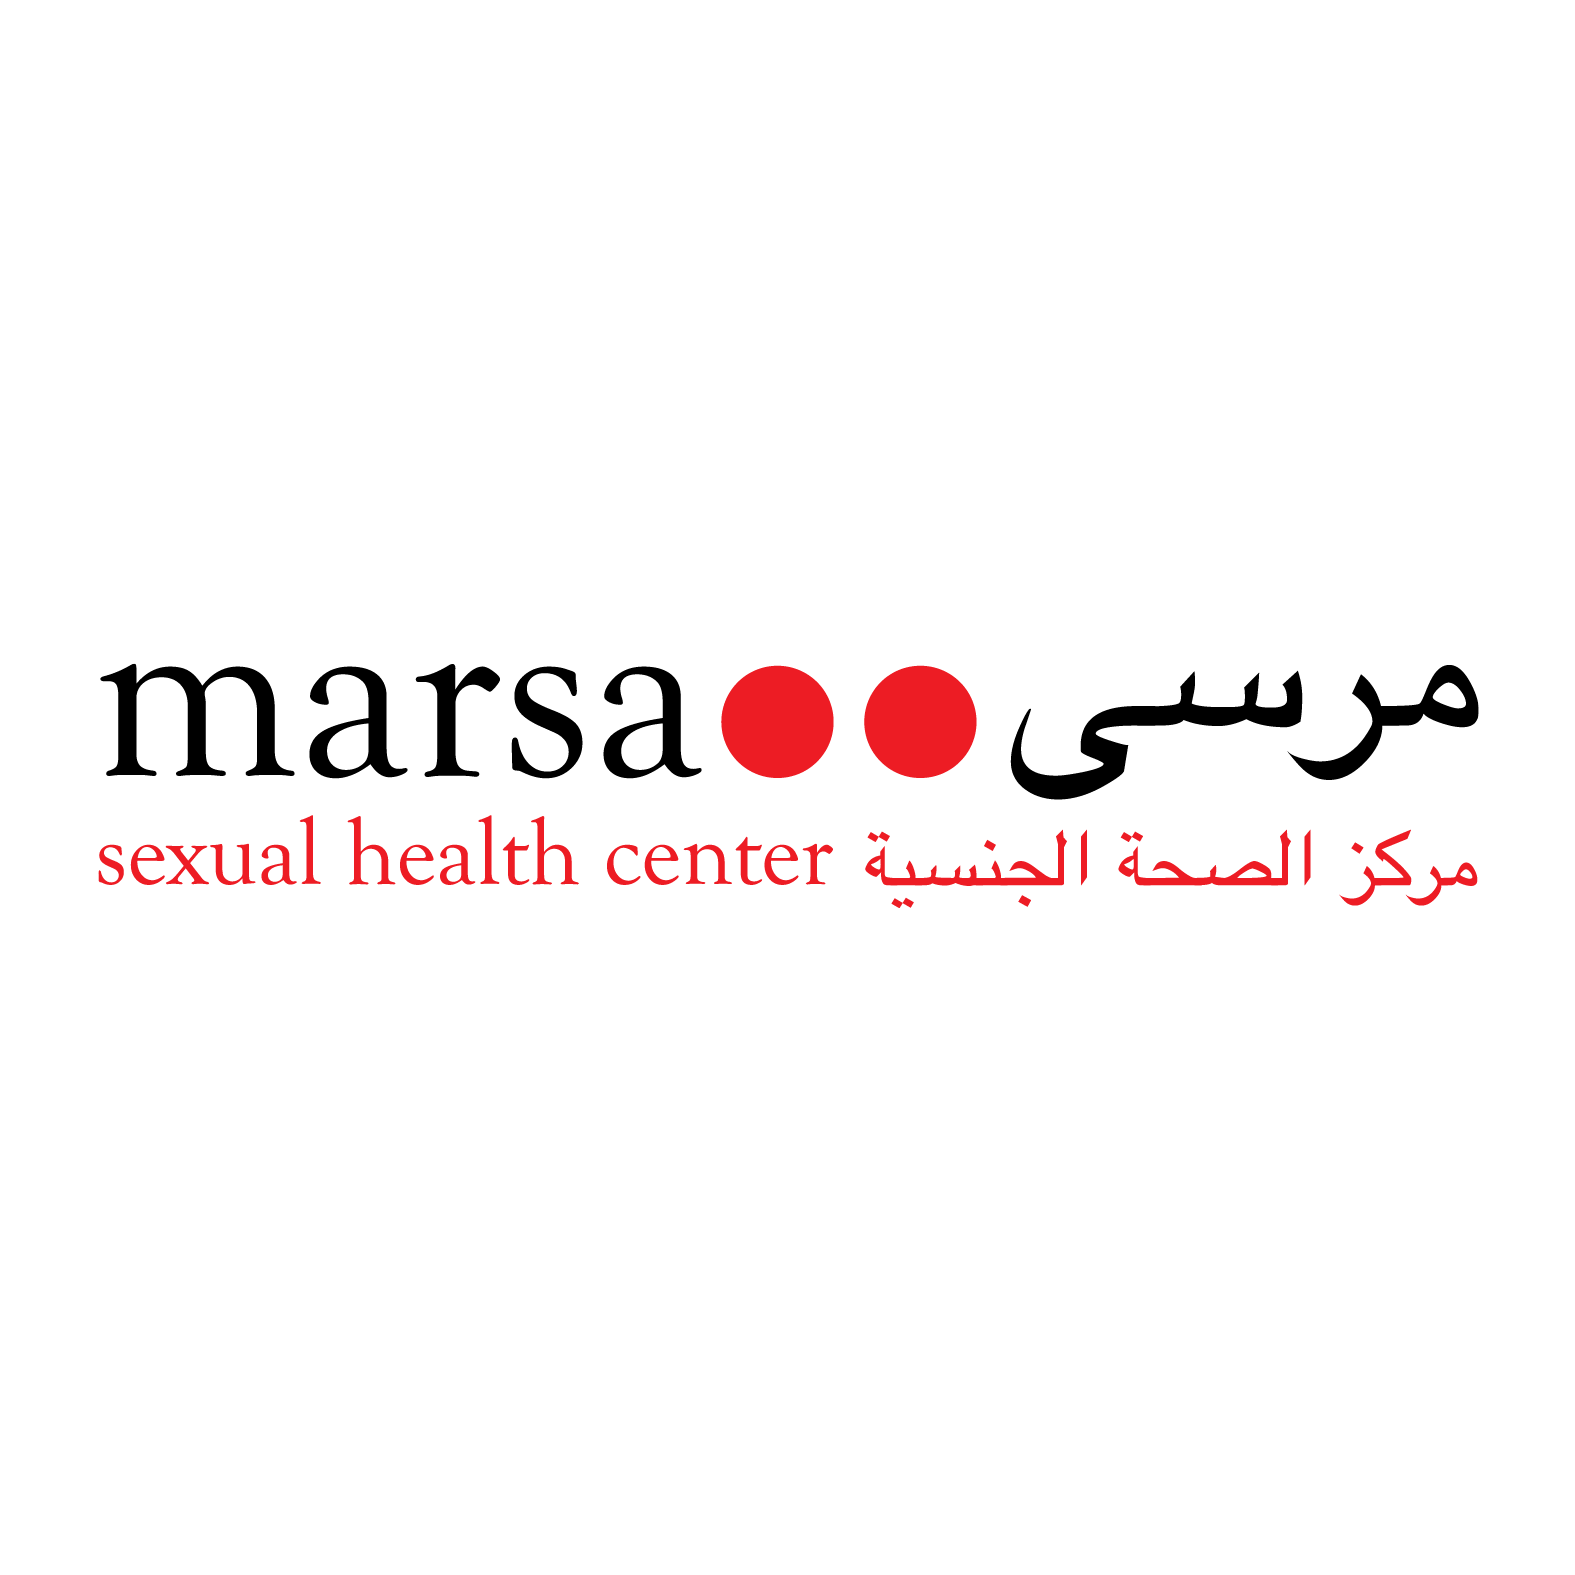 sponsor-logo16.png